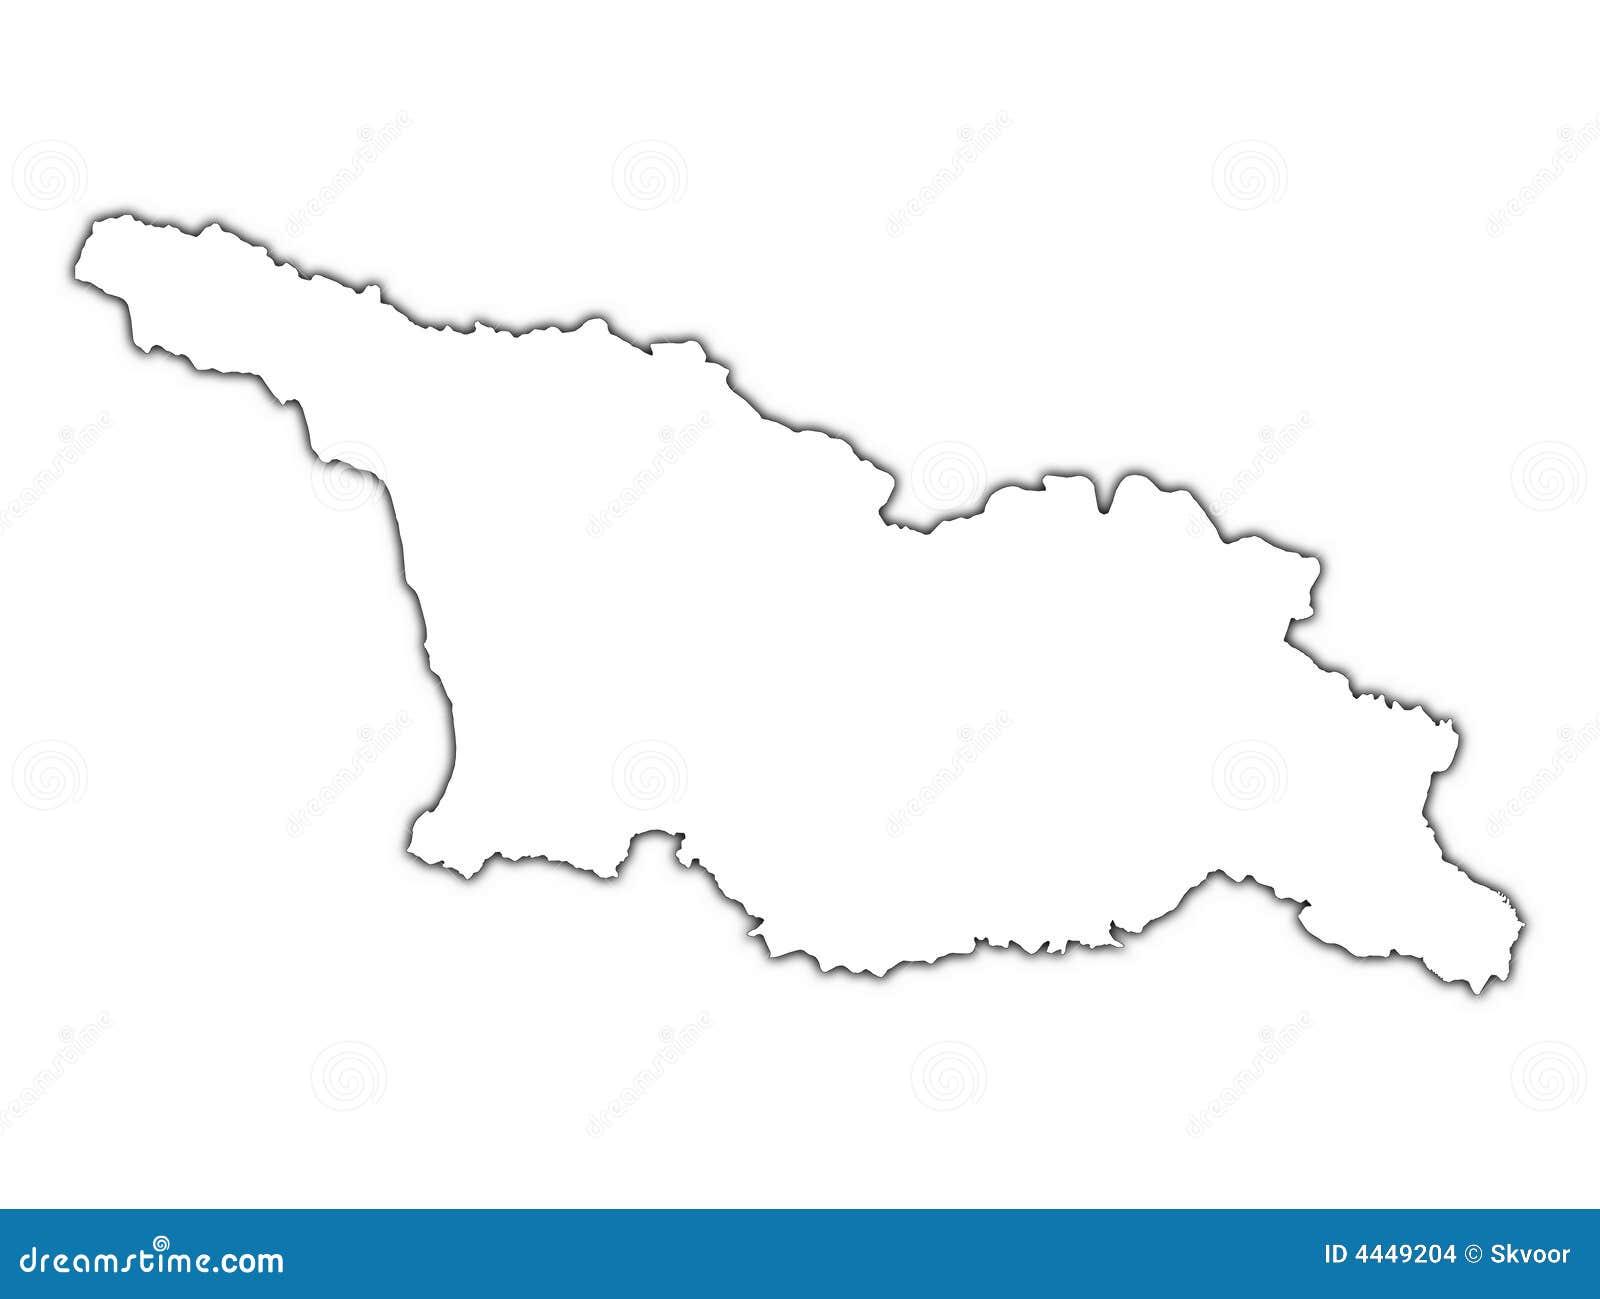 Georgia Outline Map Stock Illustration Illustration Of Black 4449204